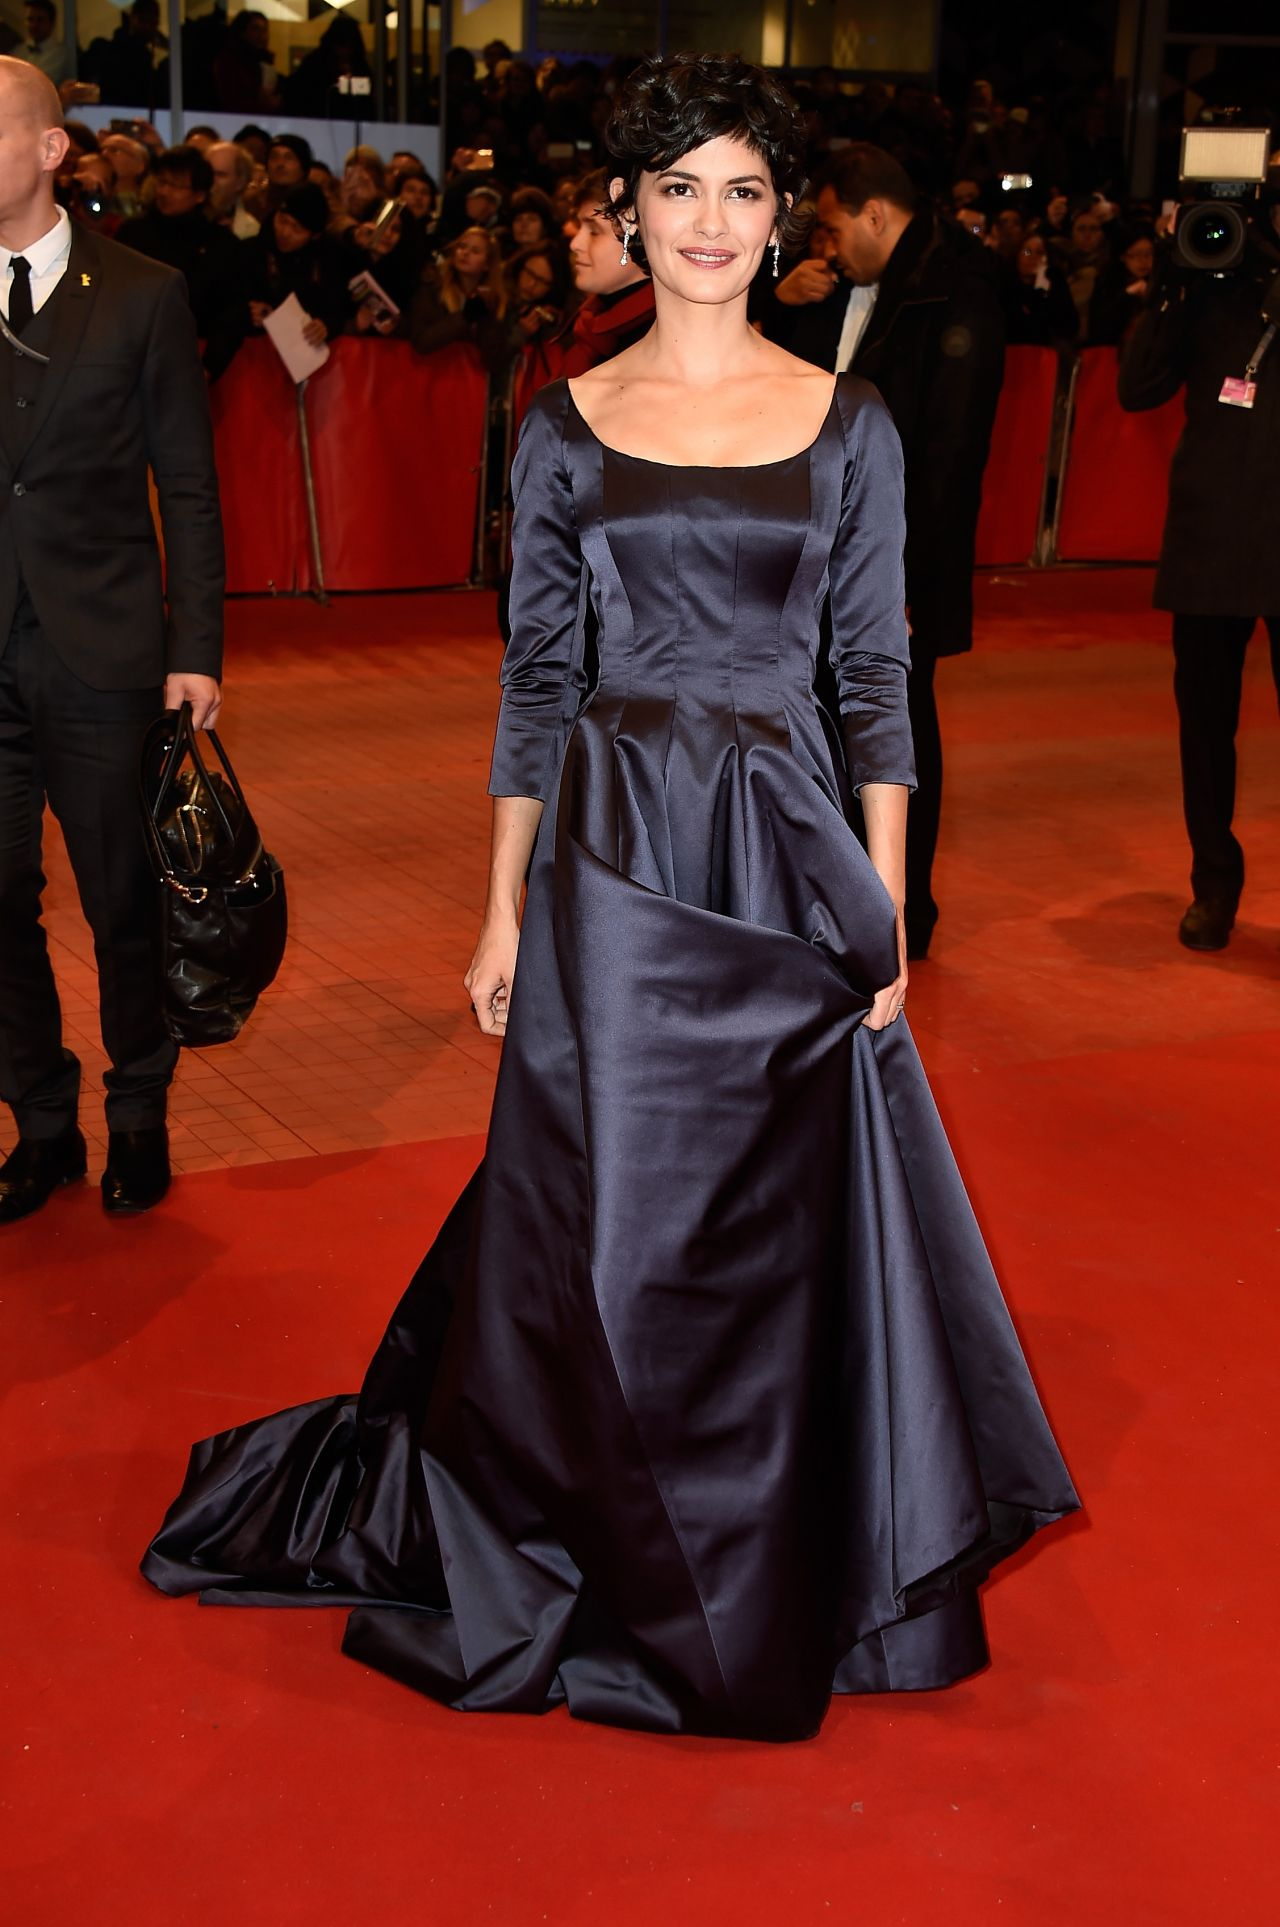 Французские знаменитости - Страница 5 Juliette-binoche-nobody-wants-the-night-premiere-at-2015-berlinale-international-film-festival_5